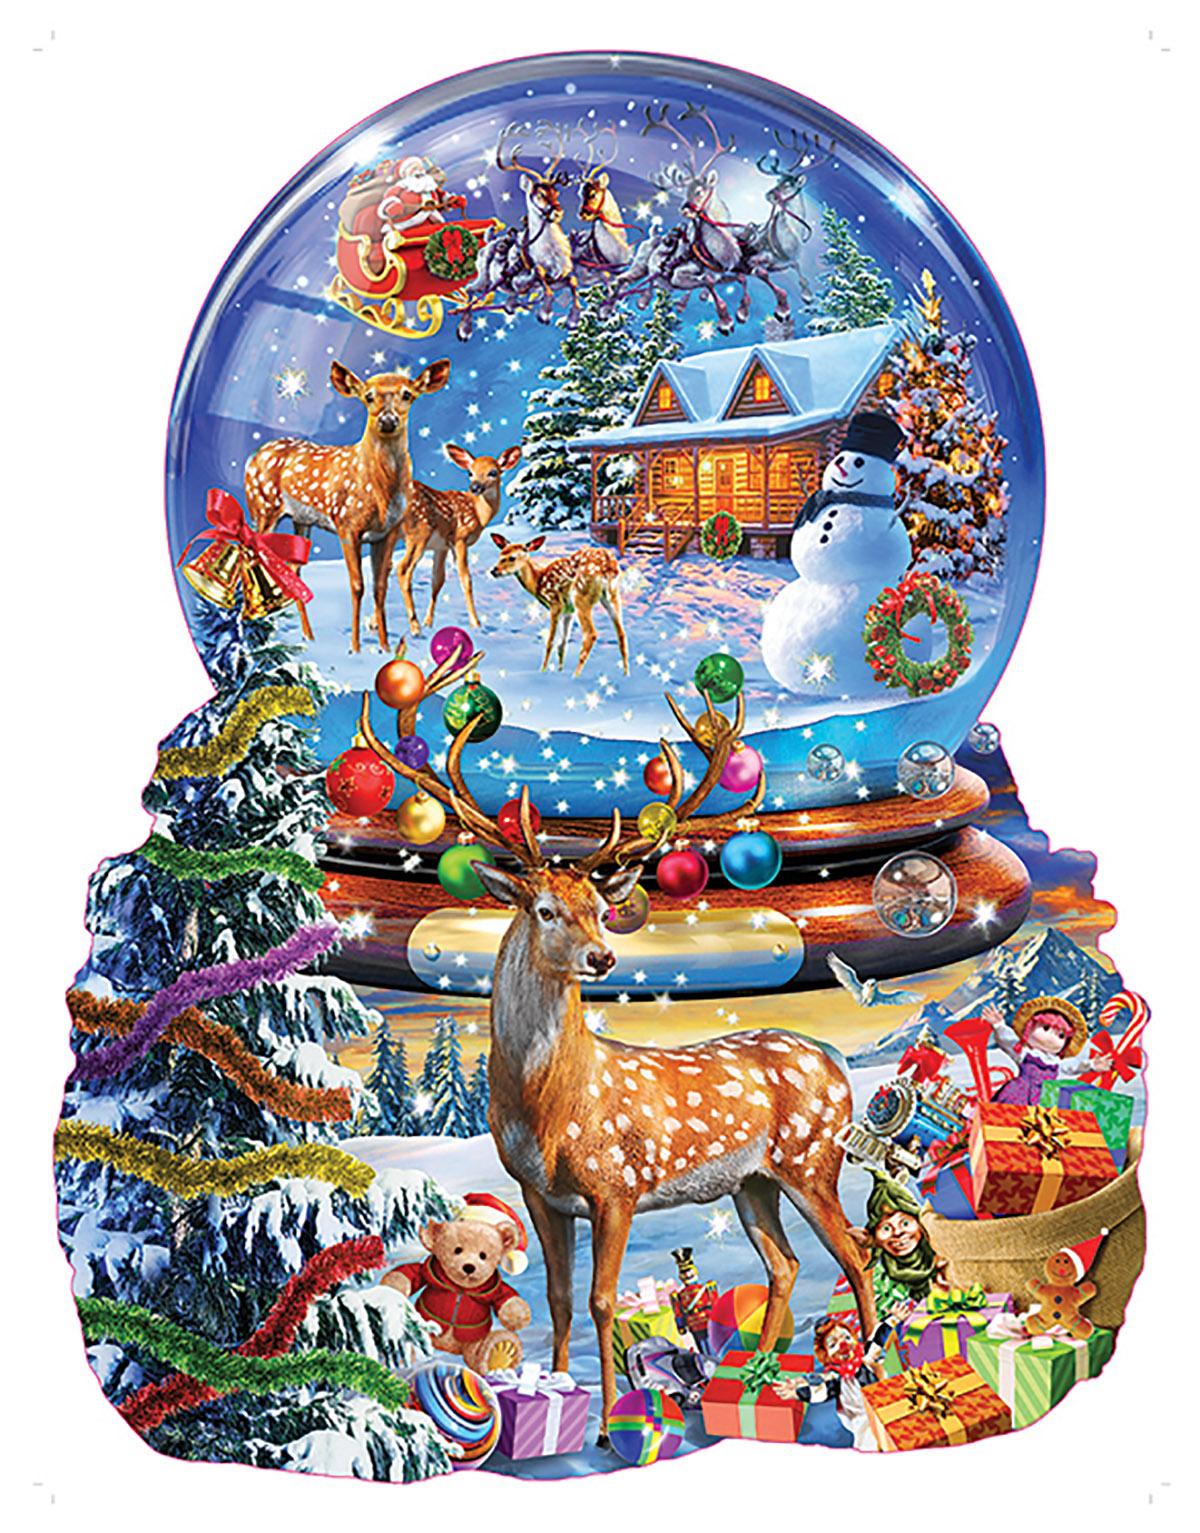 adrian-chesterman-christmas-snow-globe